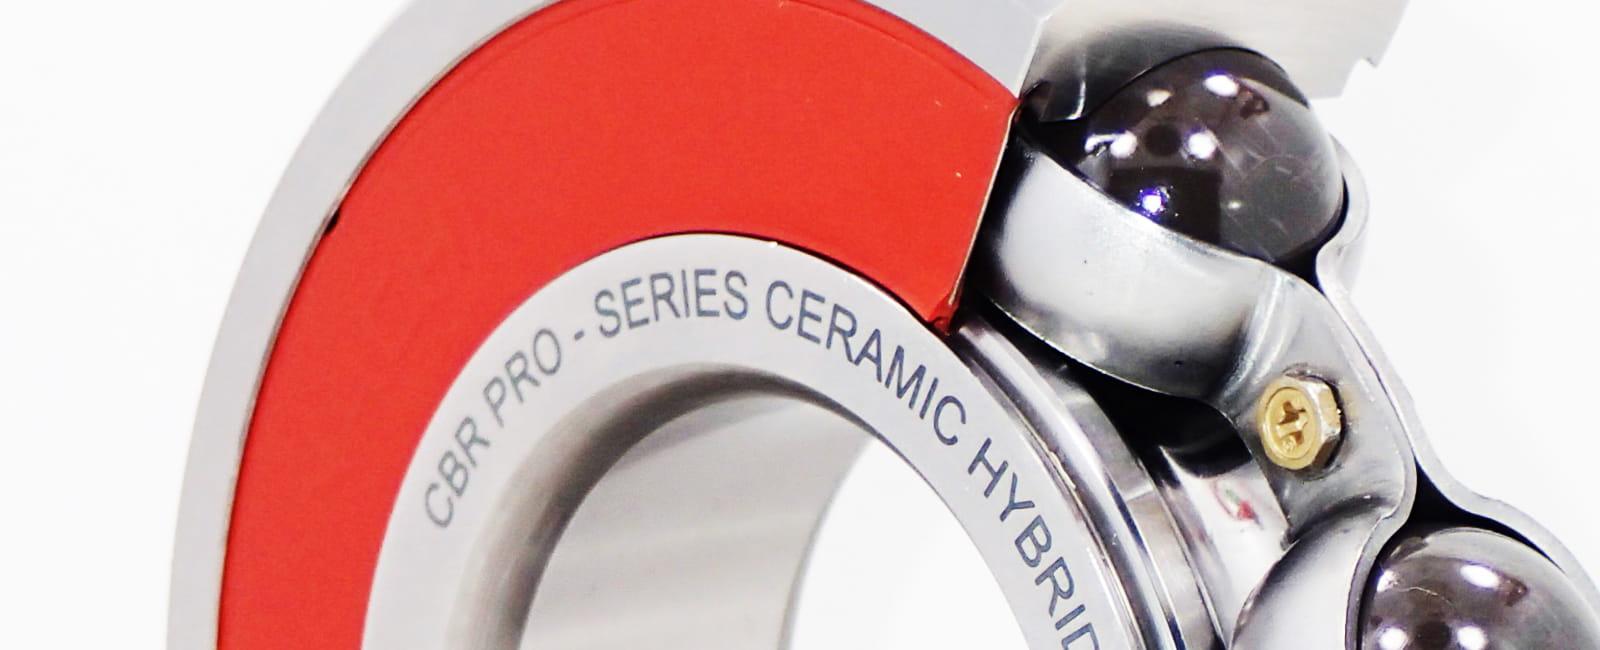 cbr bearing marketing